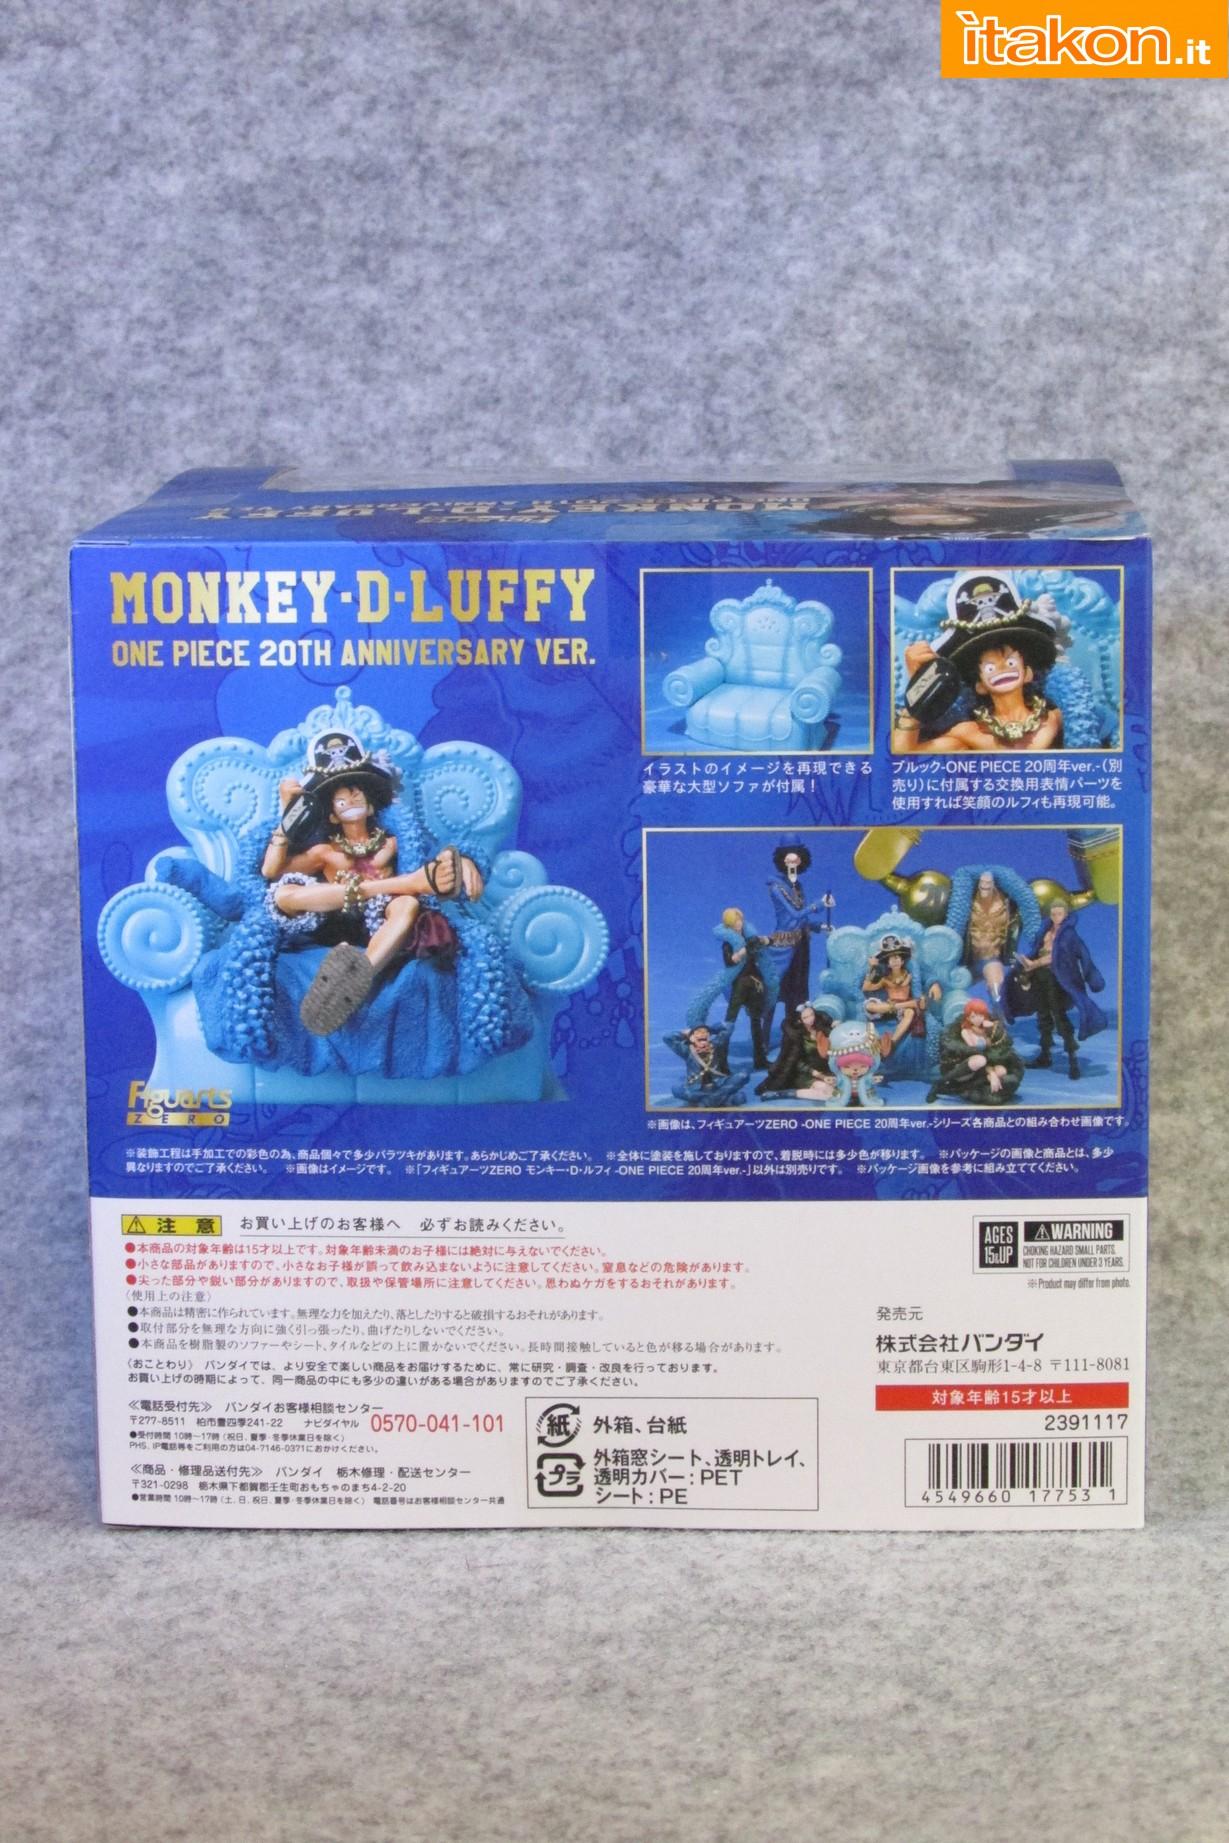 Link a Recensione Review Monkey D. Luffy One Piece 20th Anniversary ver. Figuarts ZERO di Bandai 02